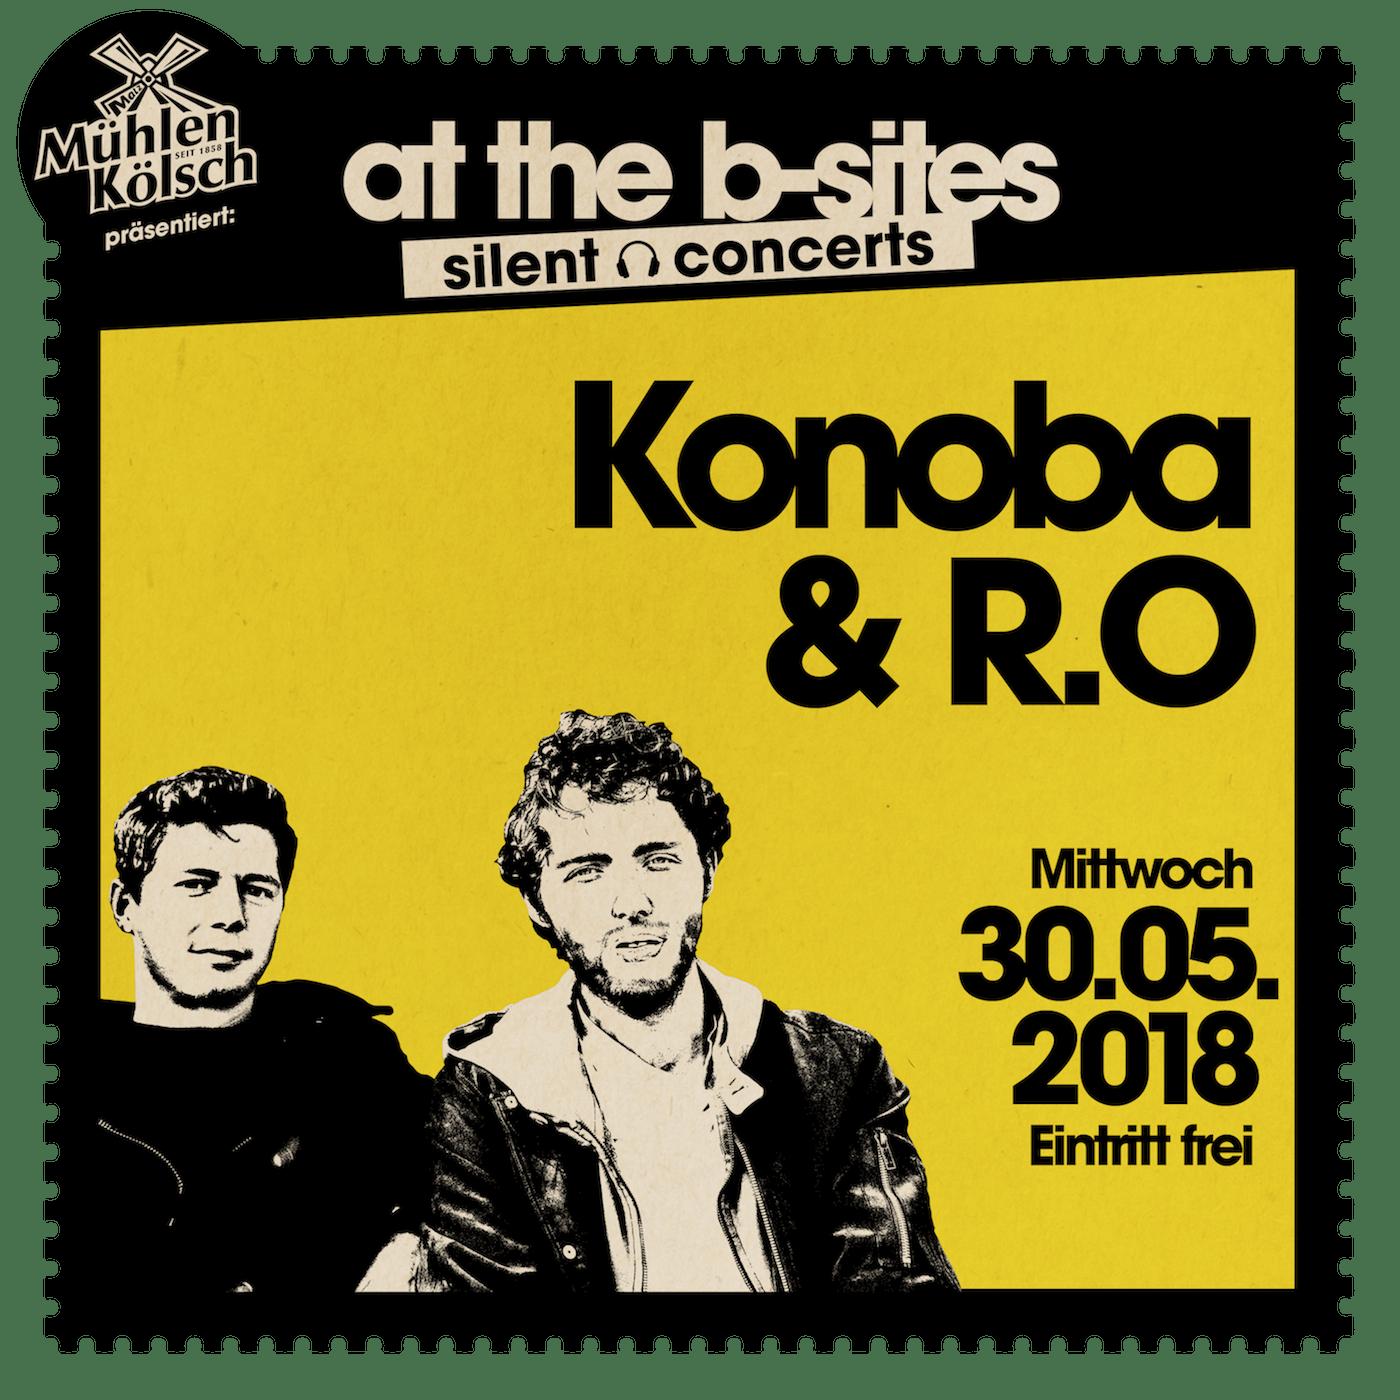 konoba ro at the b-sites